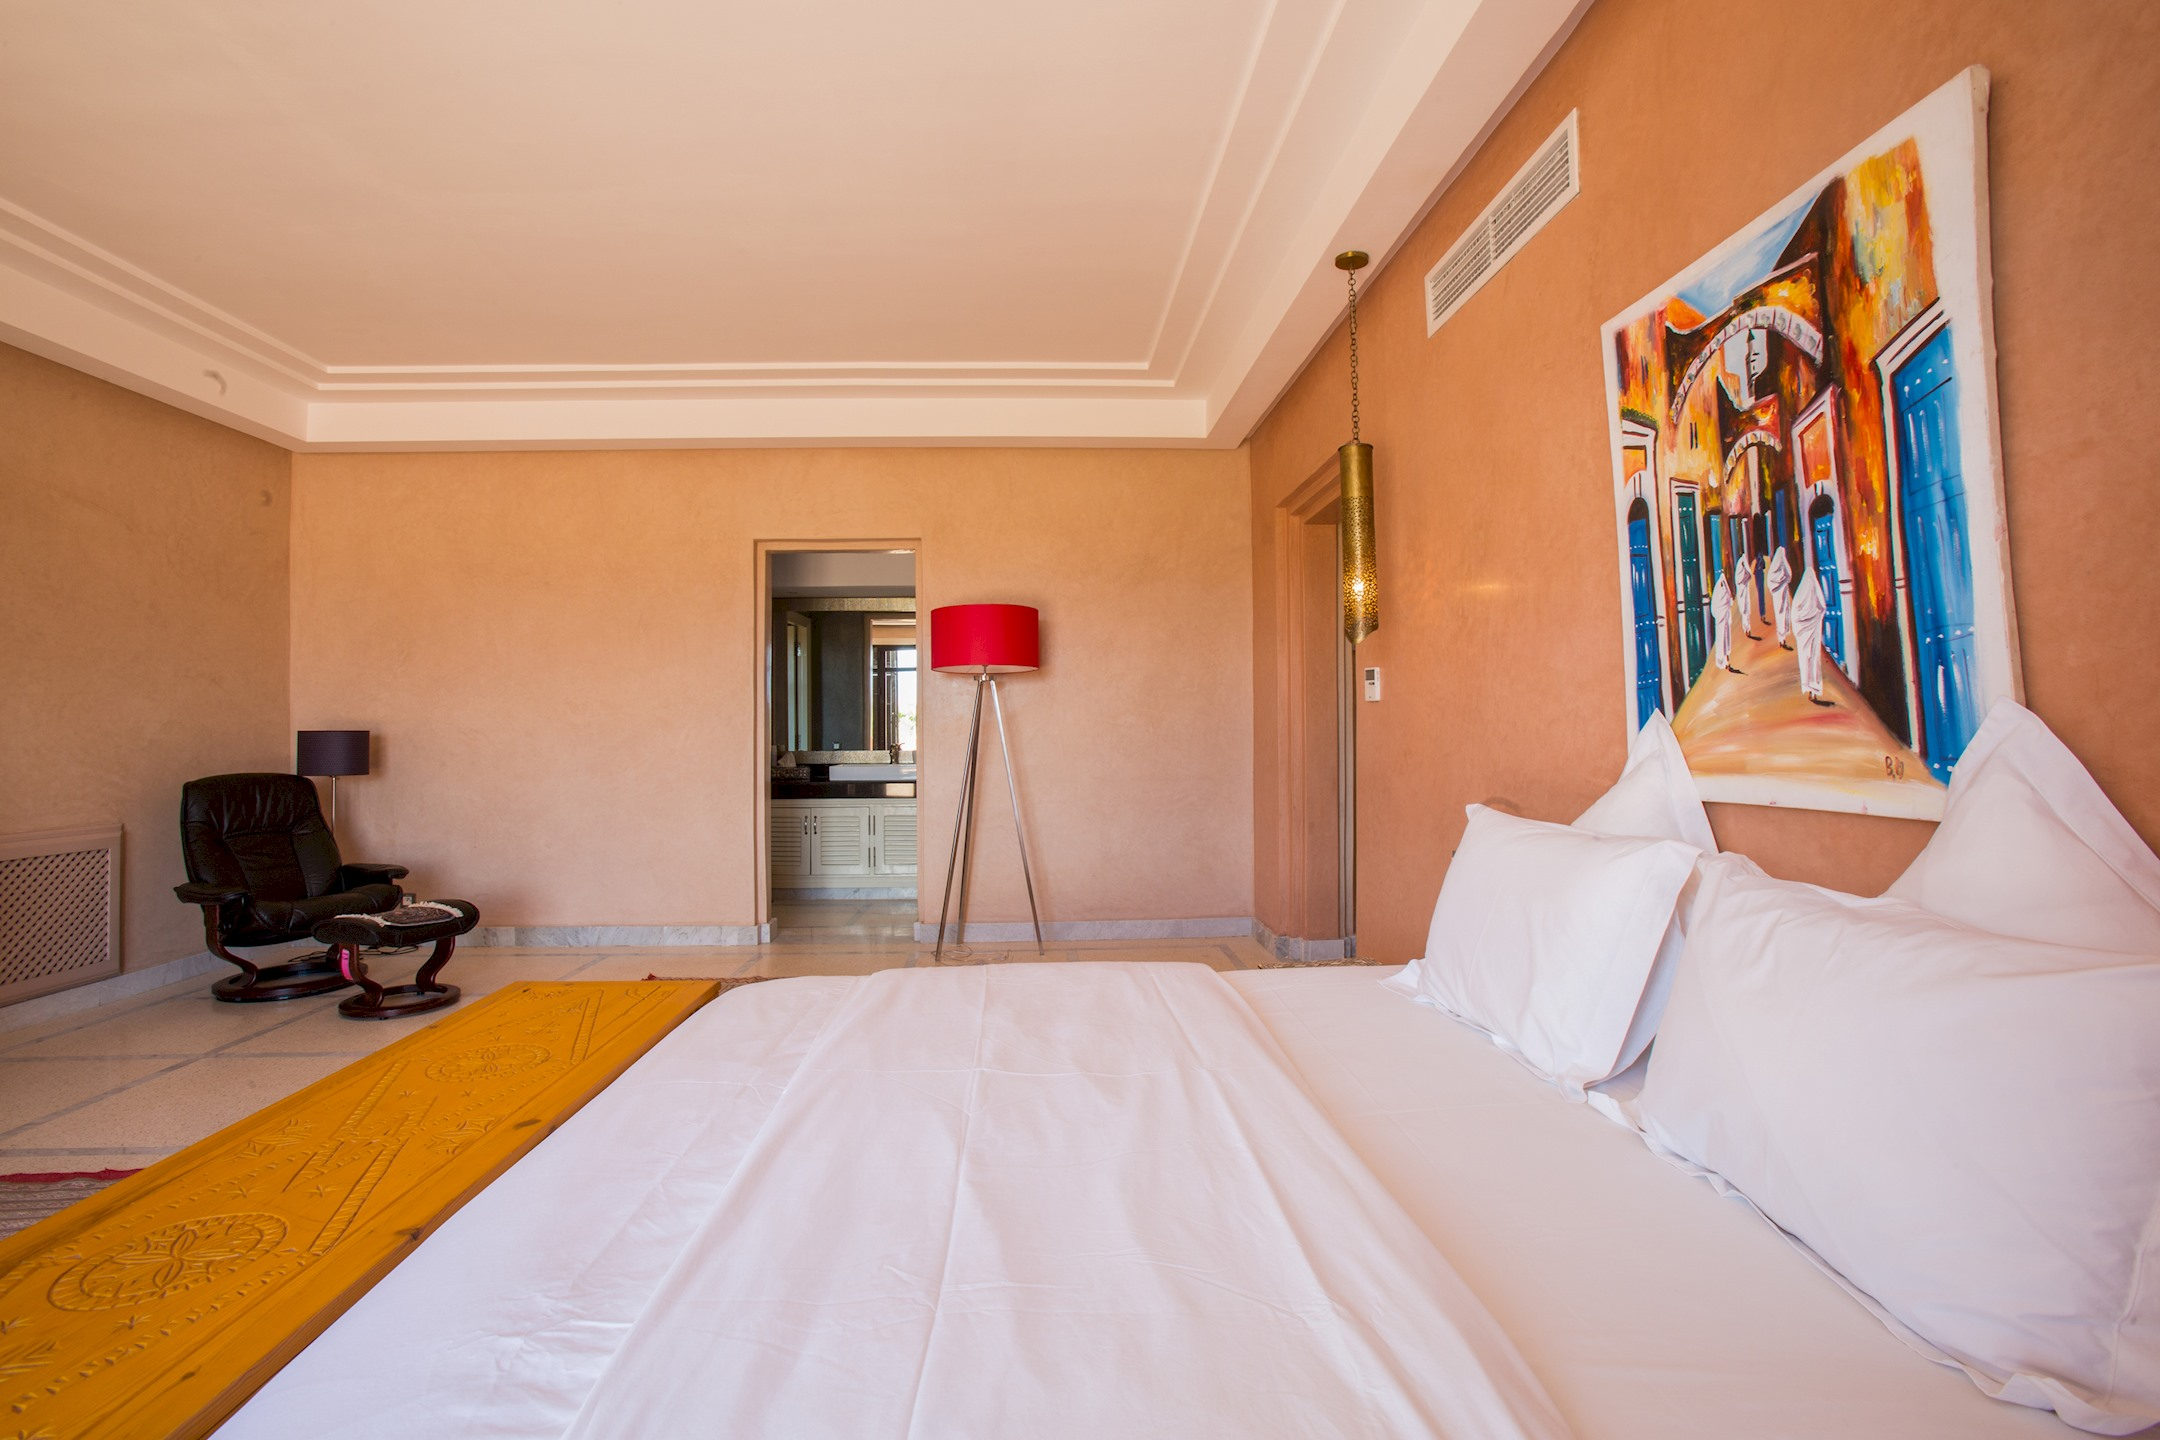 Apartment VILLA KOUTOUBIA - PISCINE CHAUFFEE  HAMMAM  JACUZZI  PETIT-DEJEUNER A MARRAKECH photo 20444594